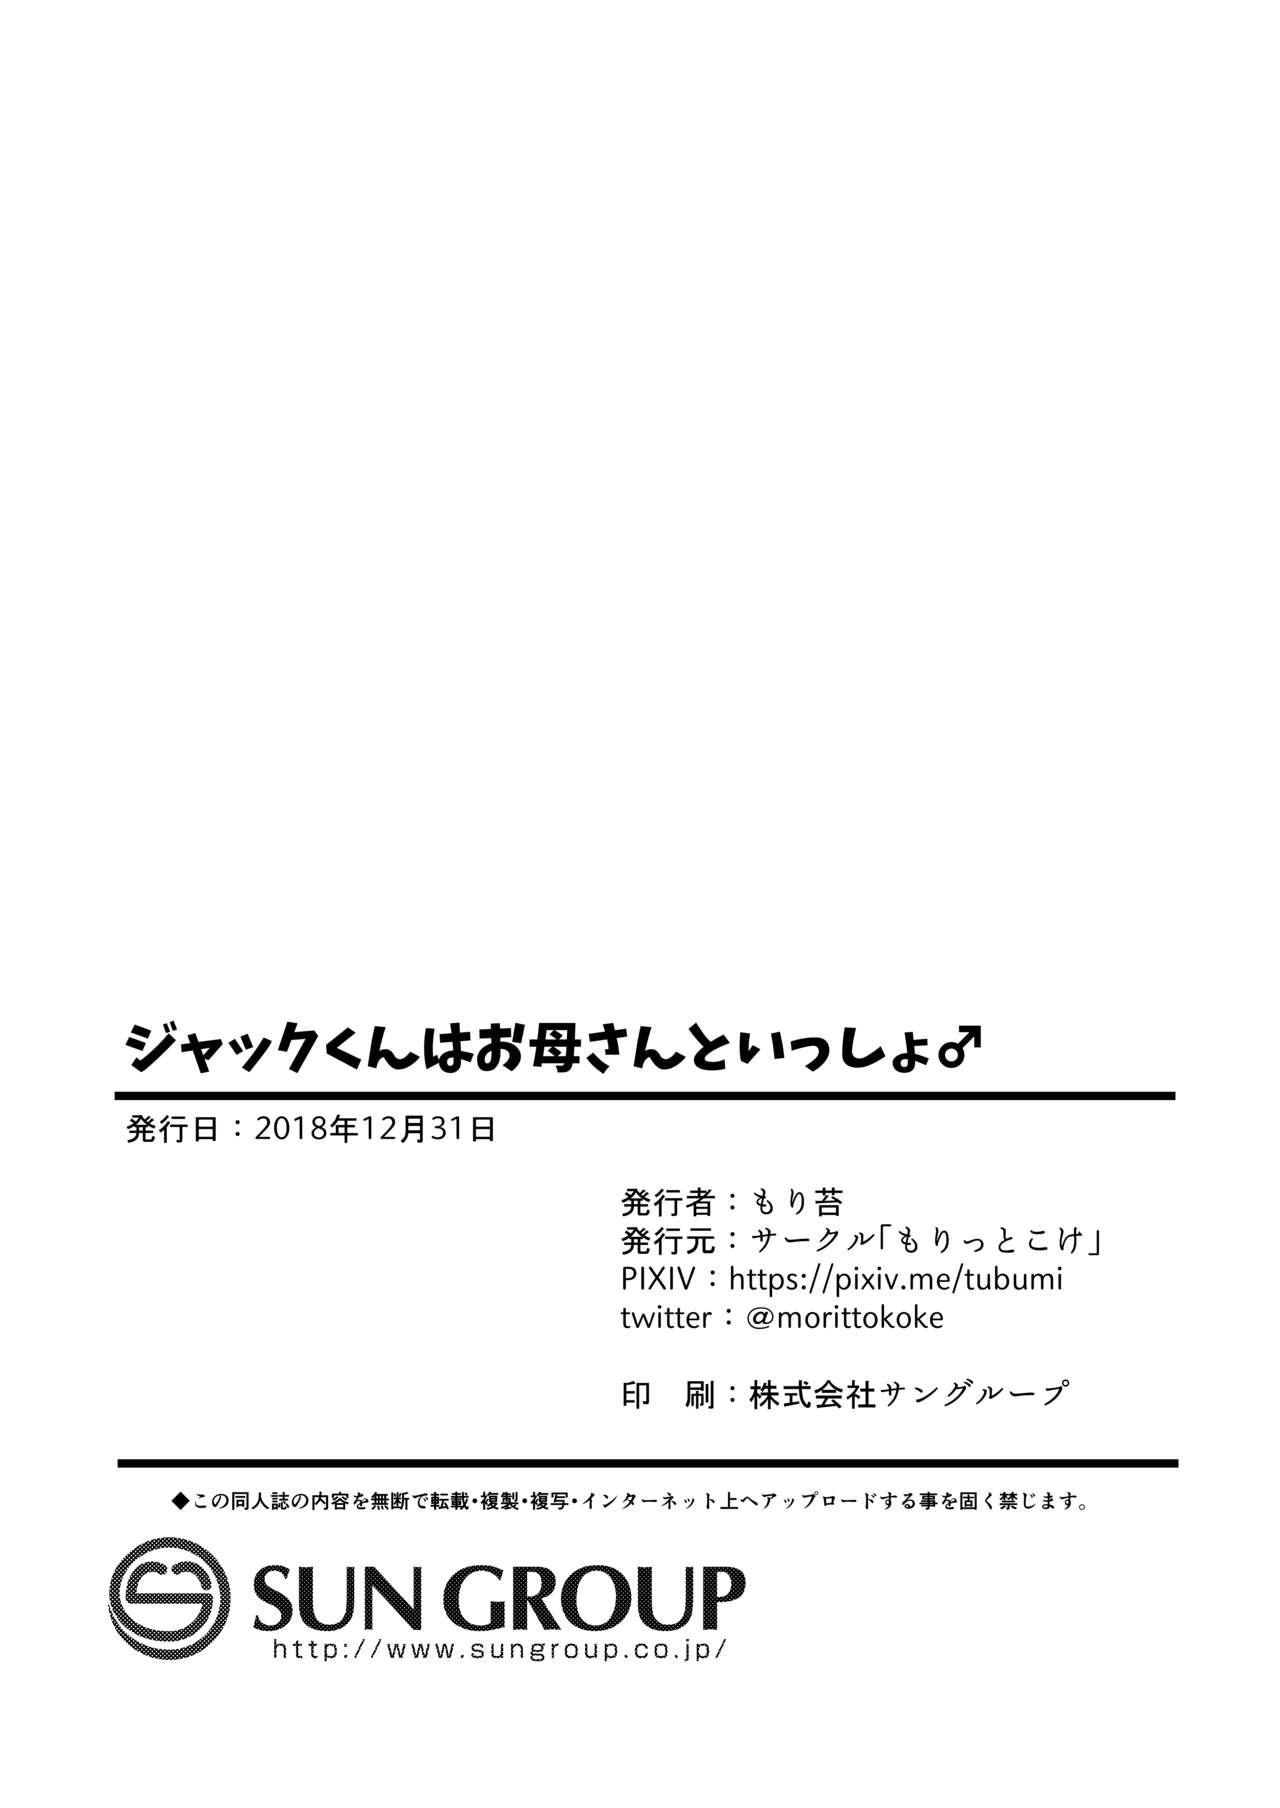 [Morittokoke (Morikoke)] Jack-kun wa Okaa-san to Issho (Fate/Grand Order) [Digital] 23